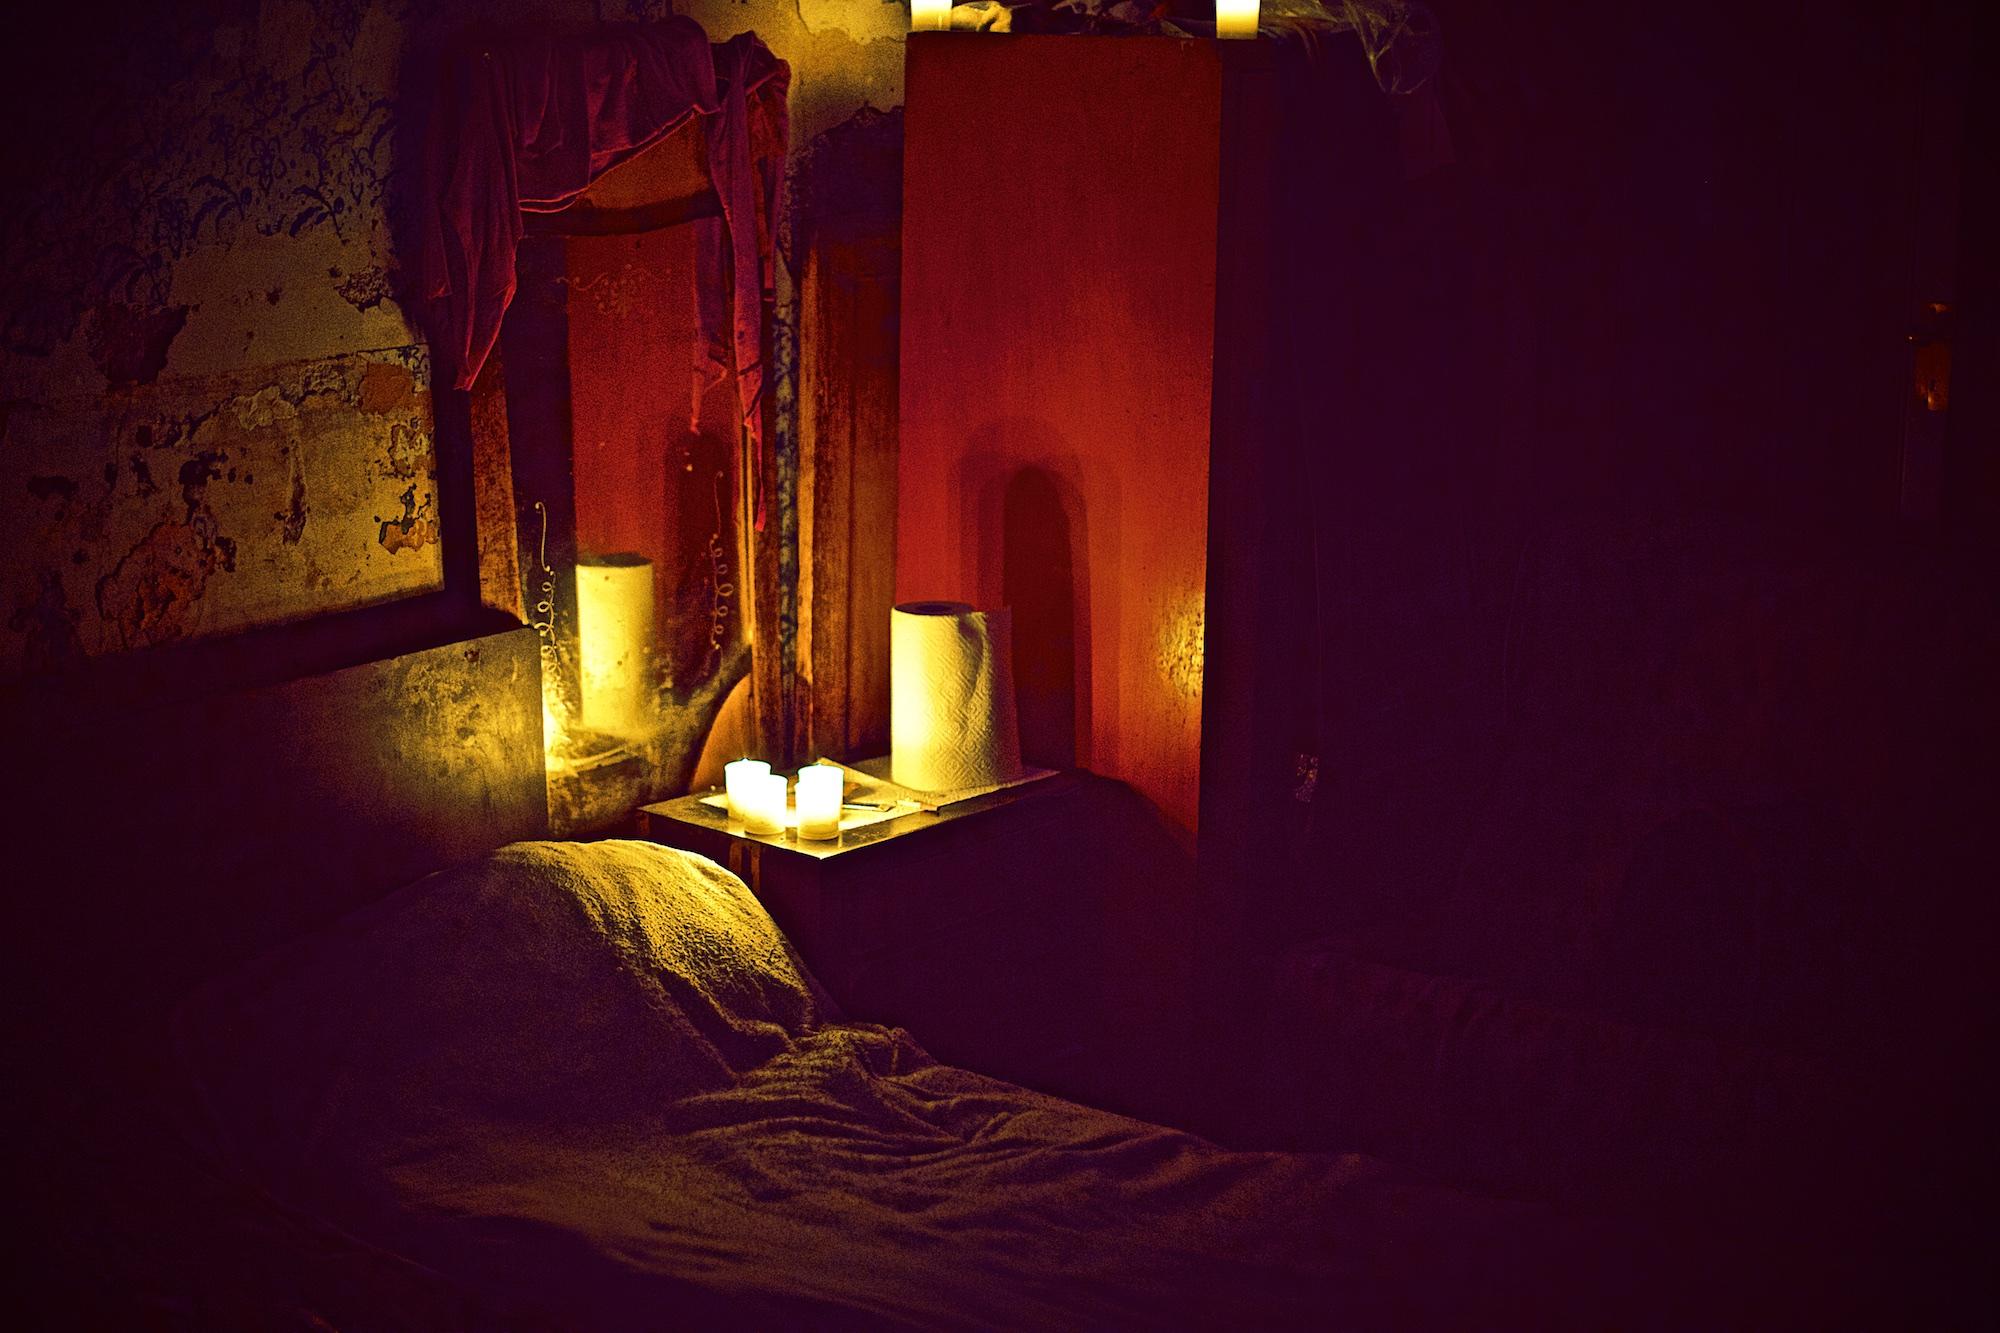 Lulù's Room